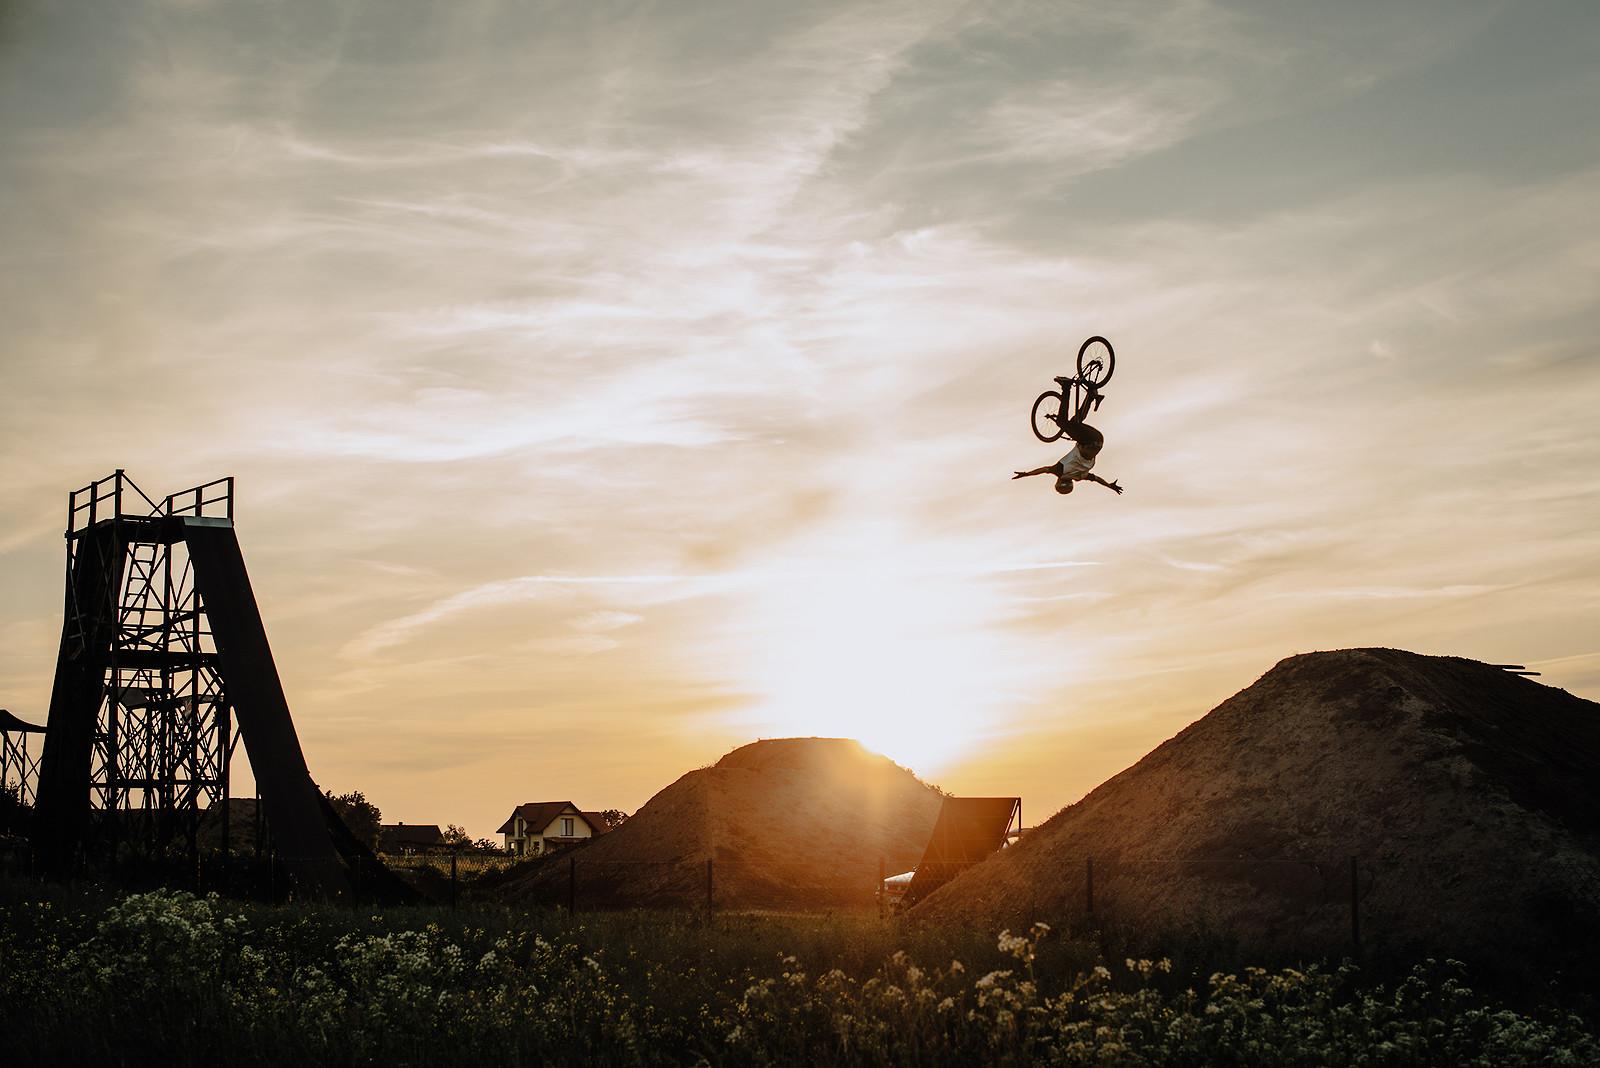 Backflip no hand - Adam_GLosowic - Mountain Biking Pictures - Vital MTB